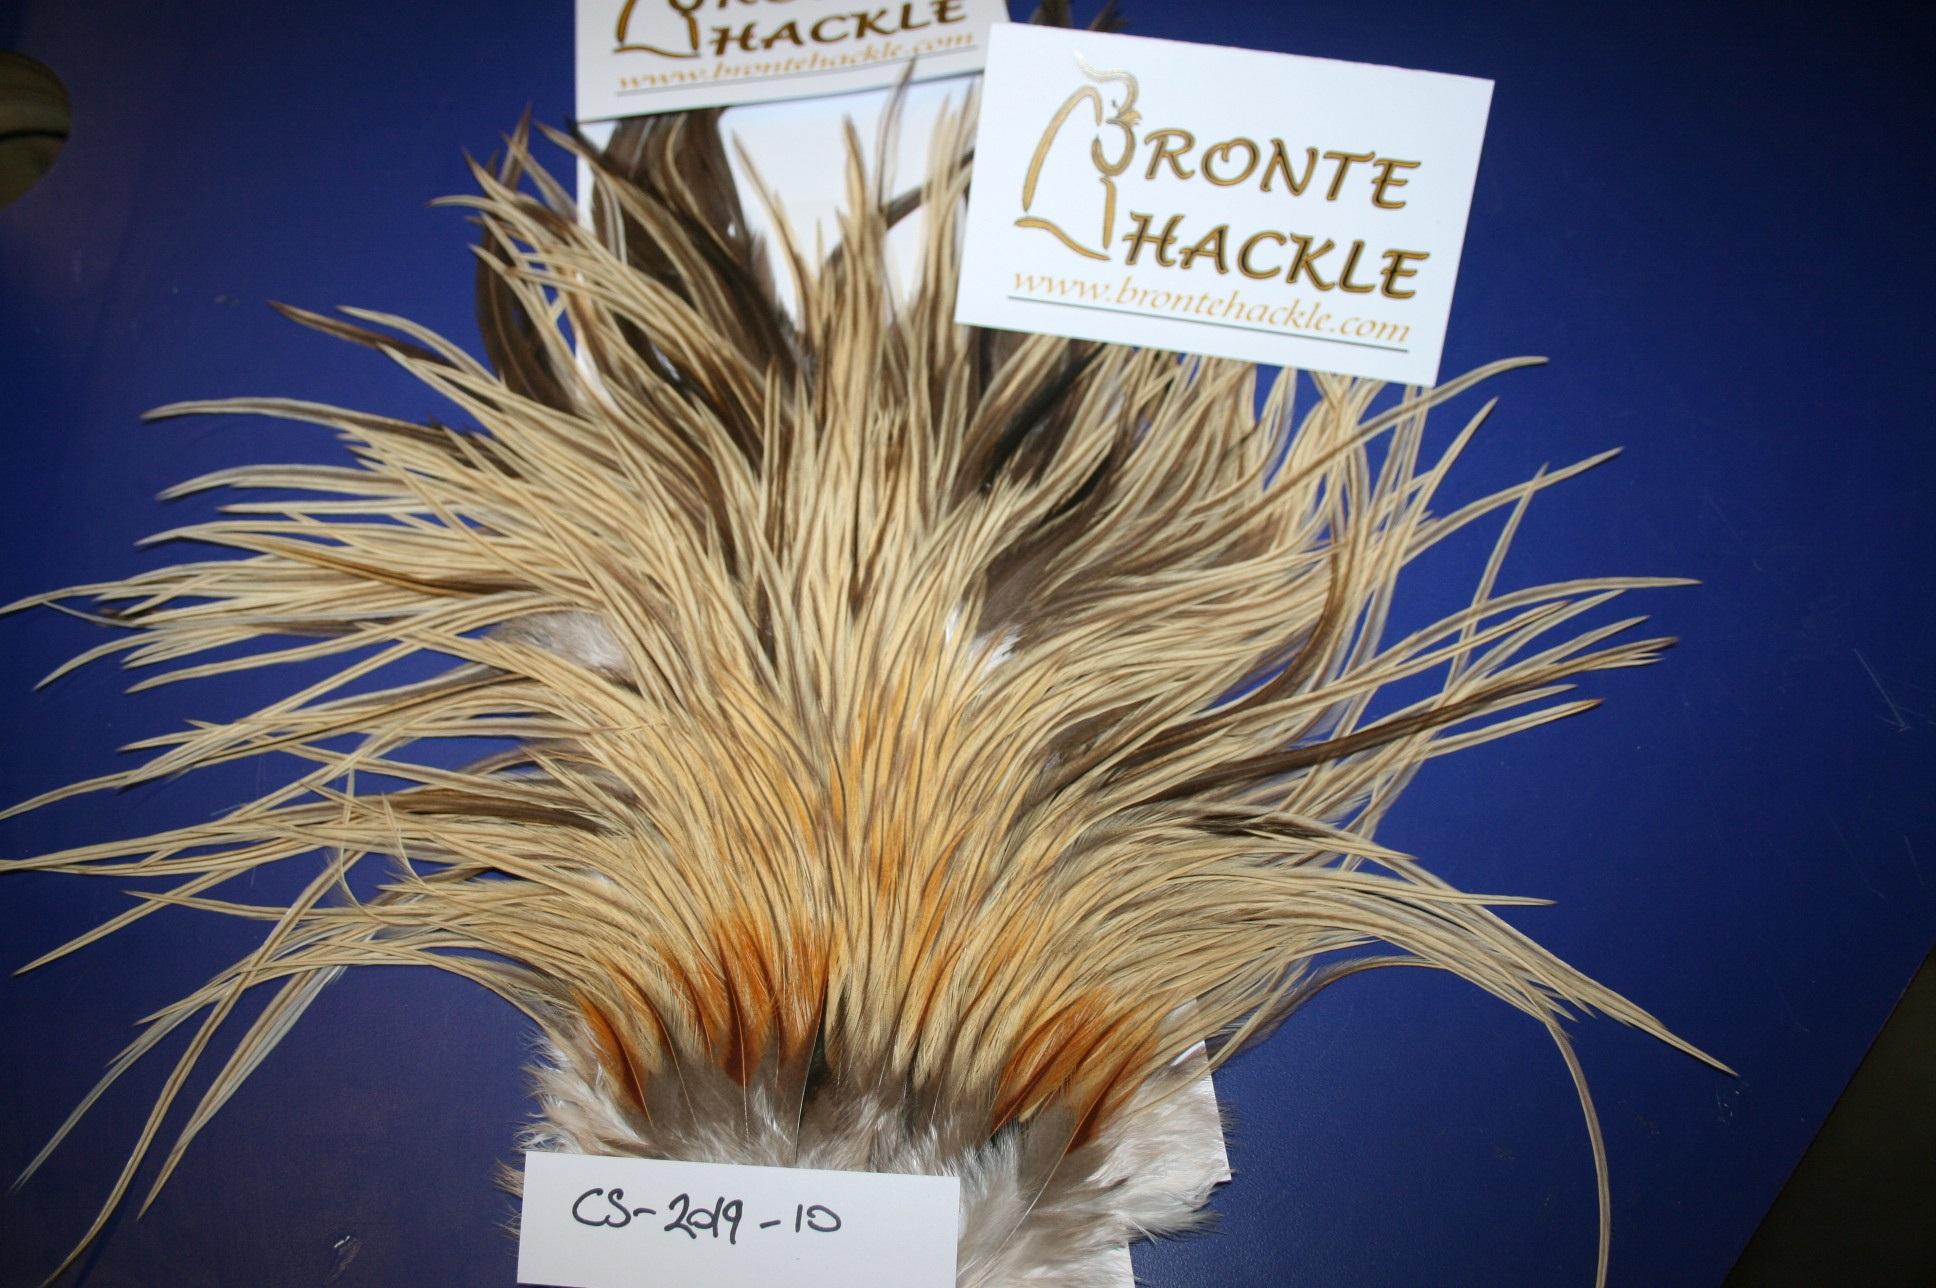 Bronte Hackle Cock Saddles               cs-2019-10